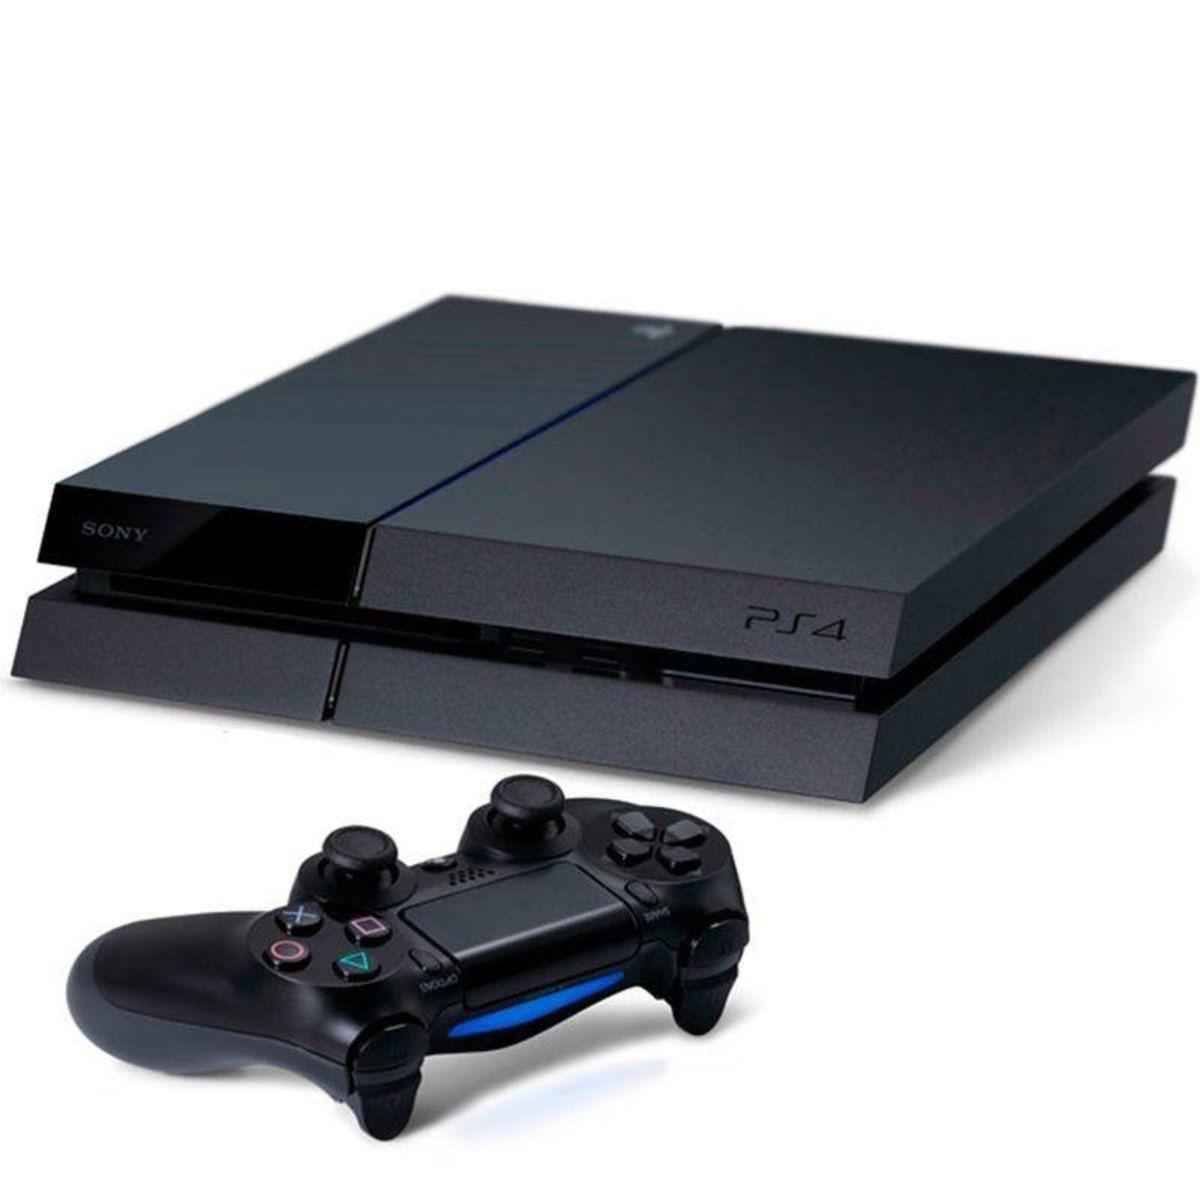 Console Playstation 4 1Tb Bundle com 3 jogos